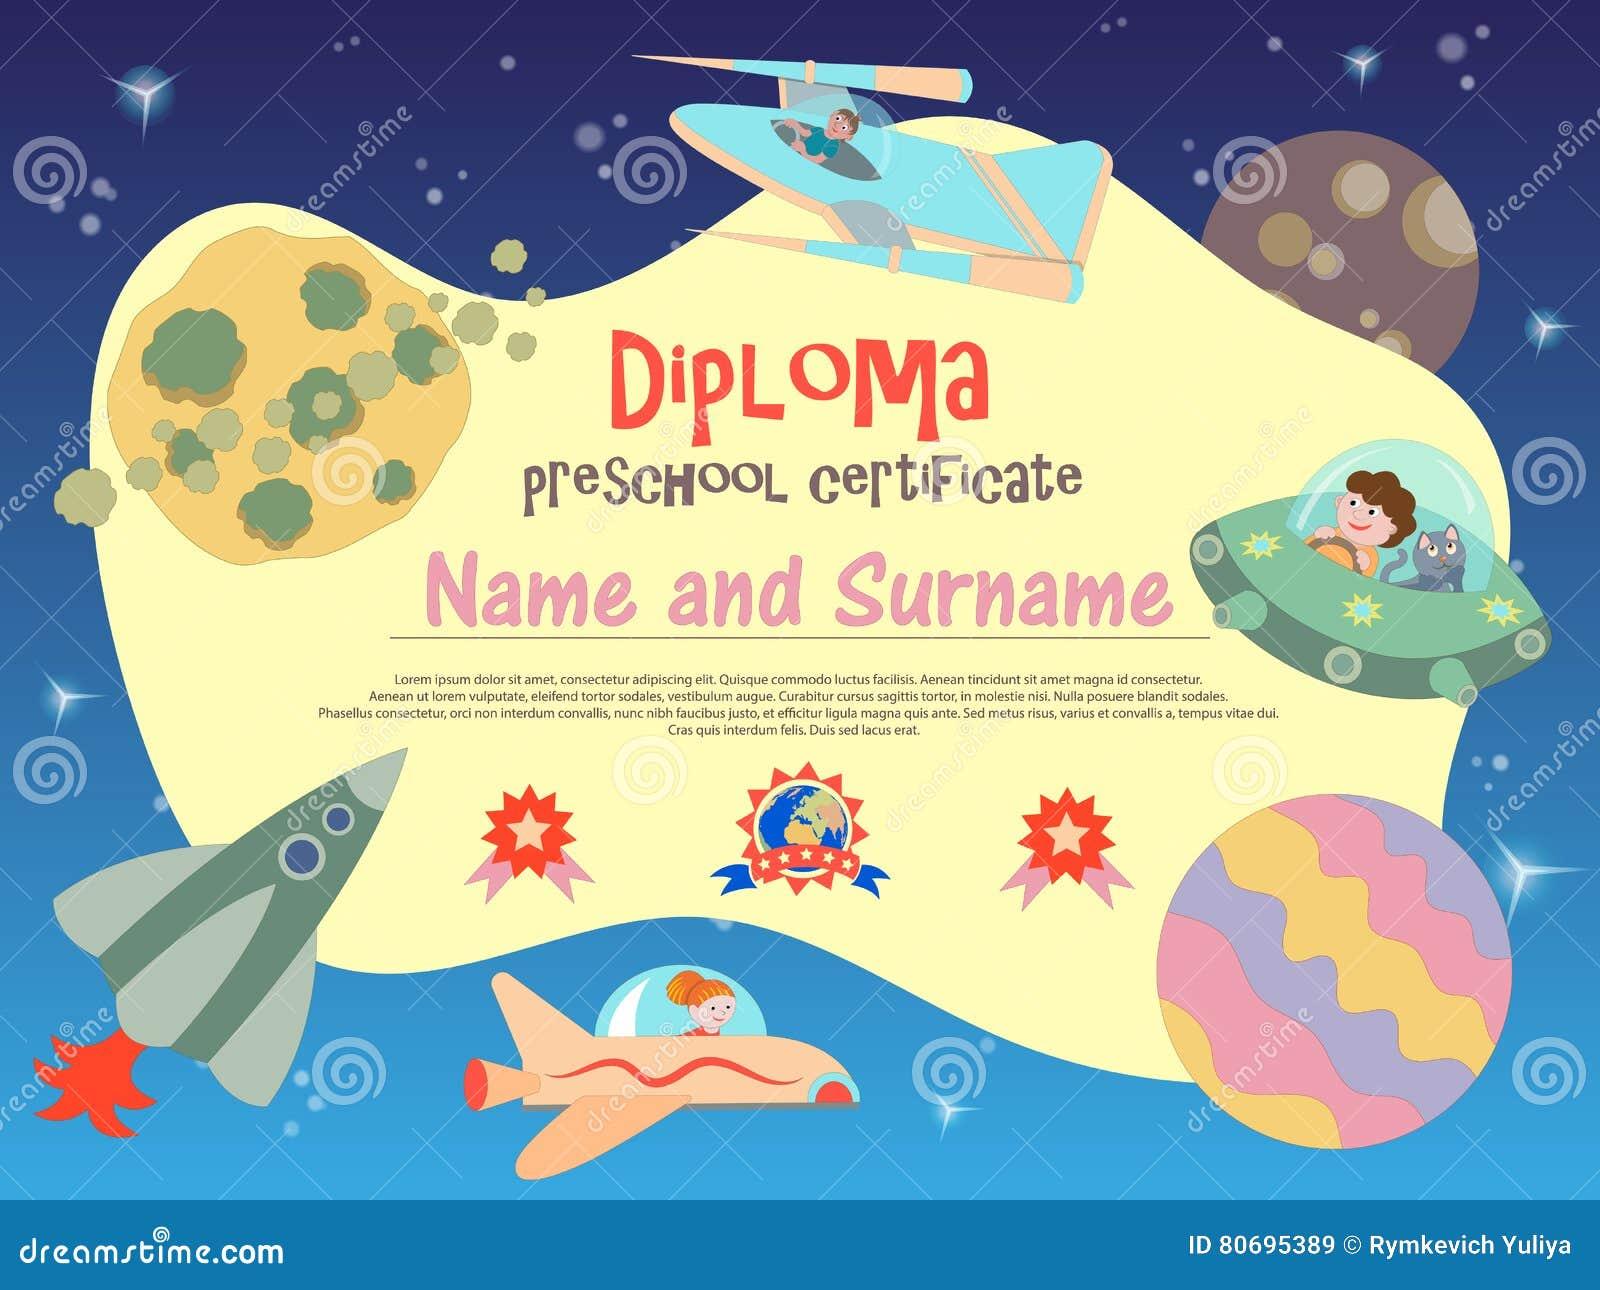 Diploma preschool certificate Space Theme